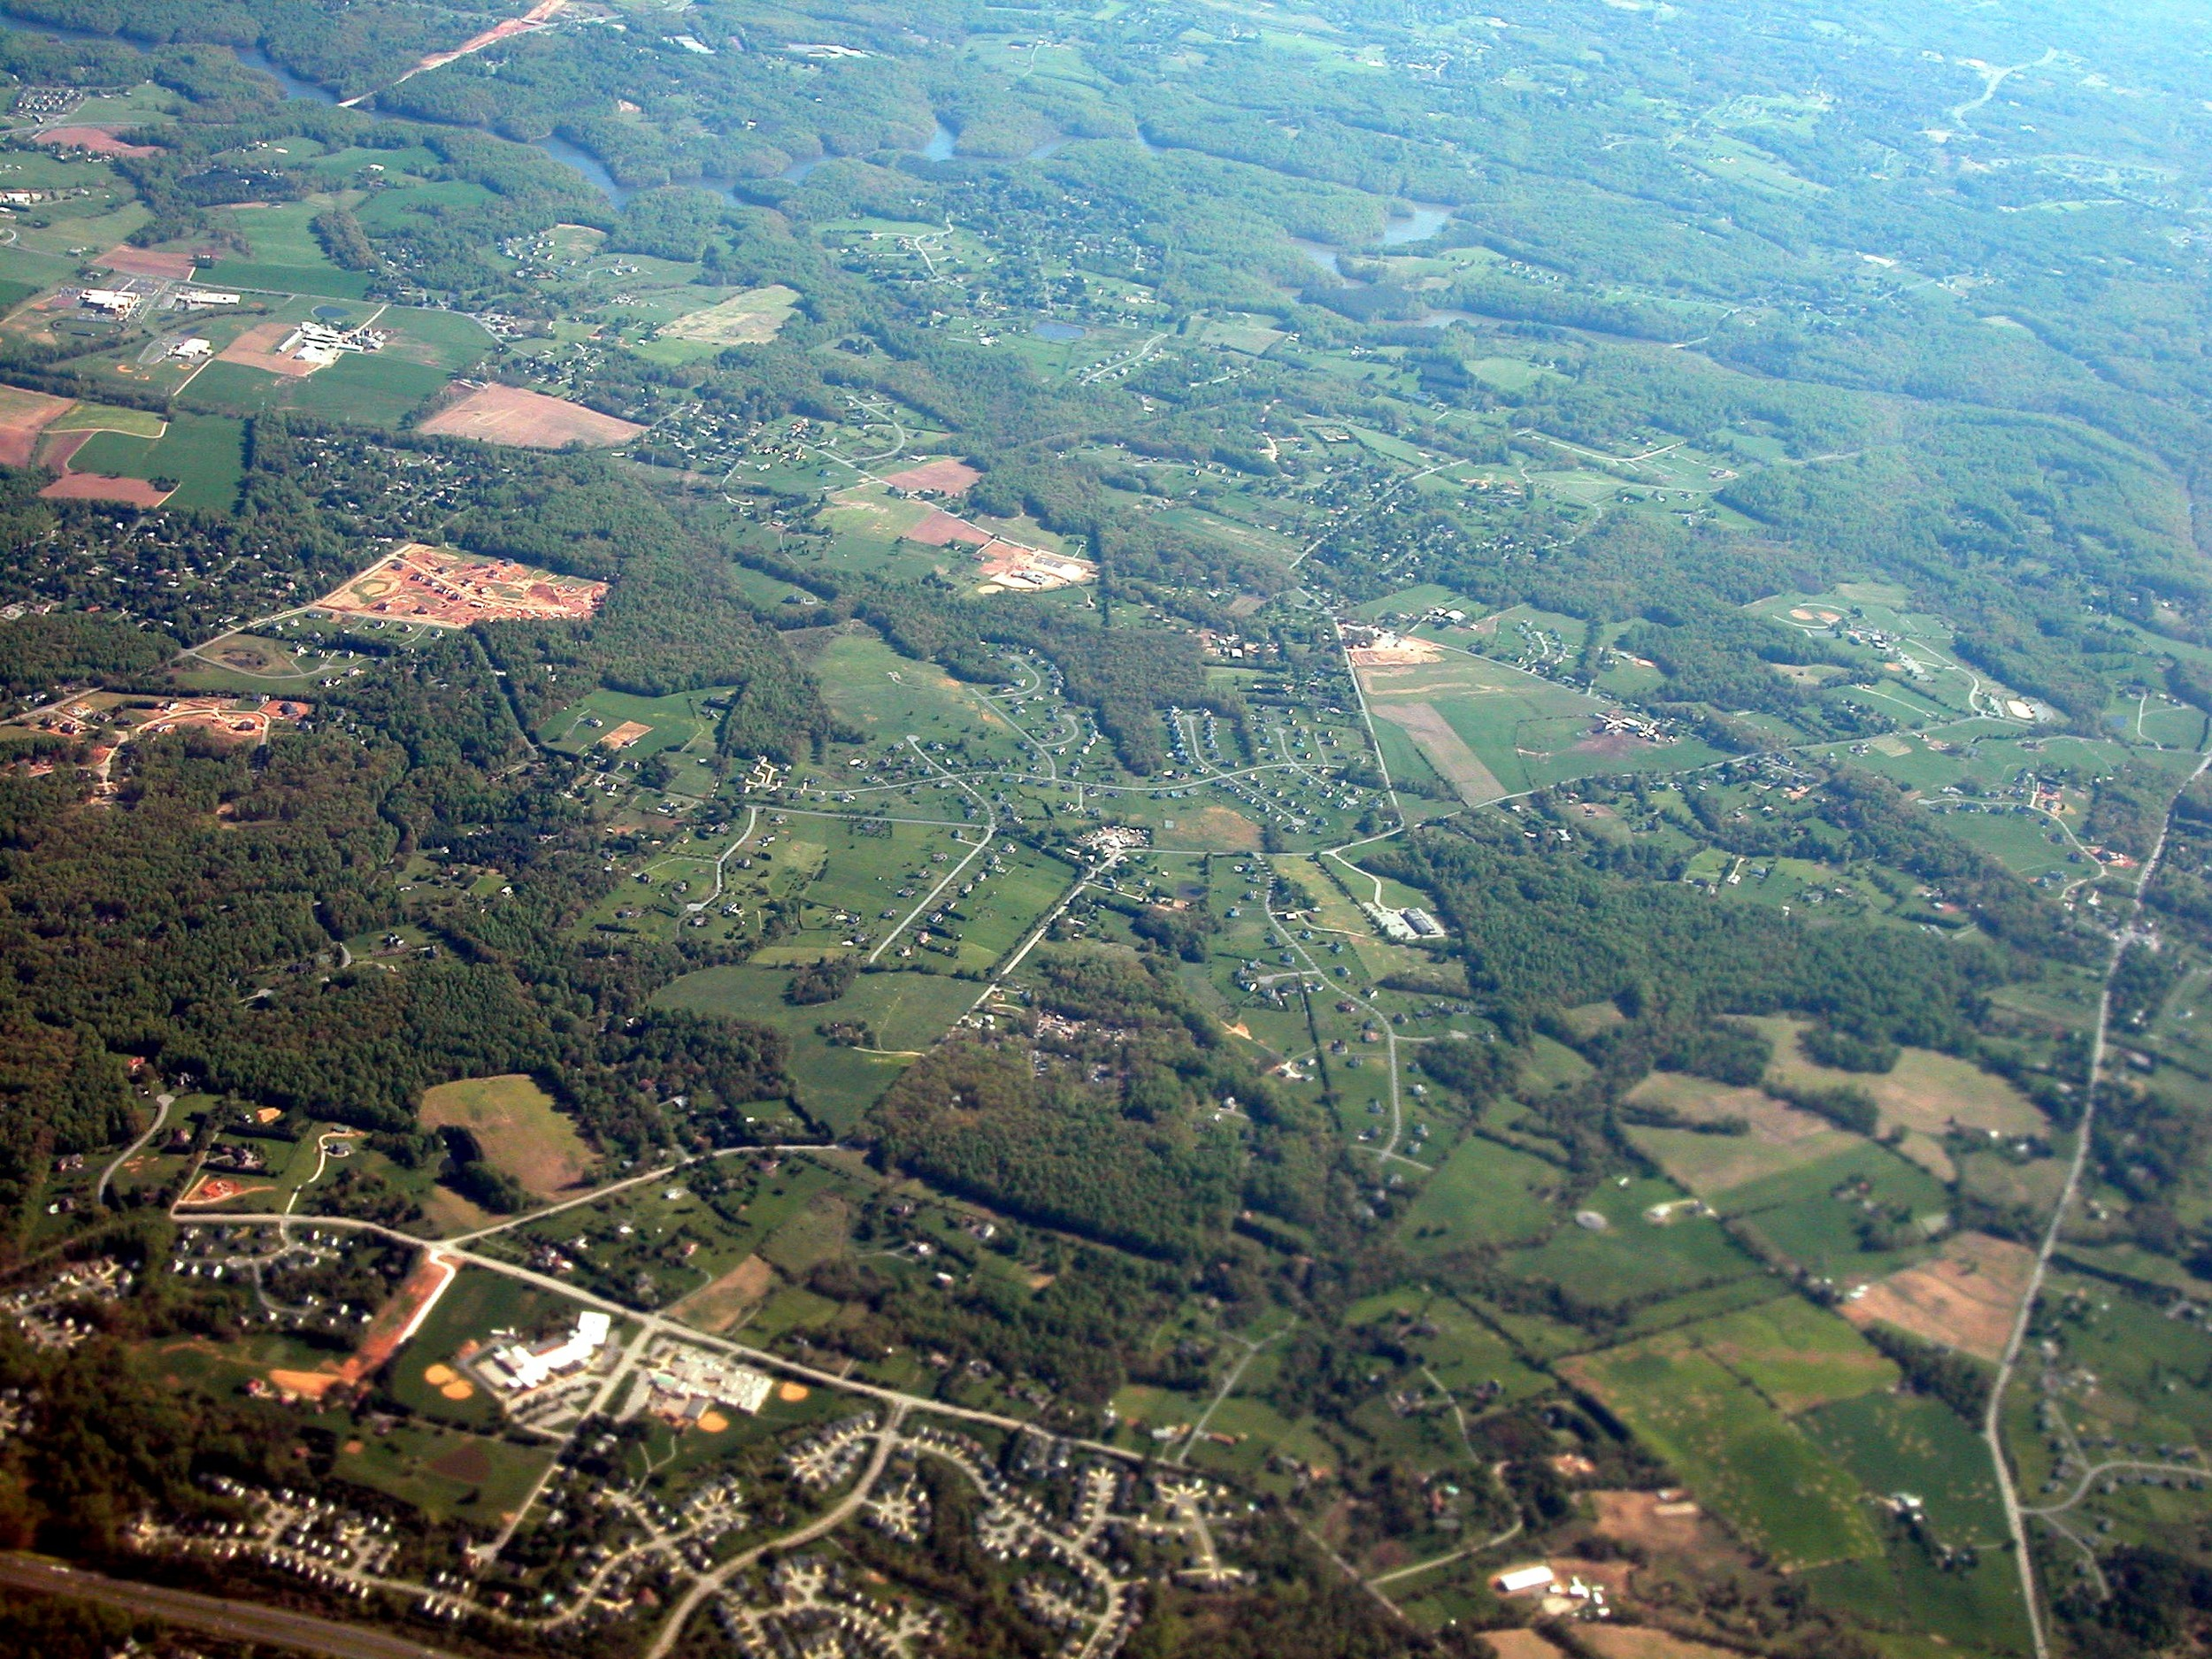 Photo of suburban maryland by David Wilson.